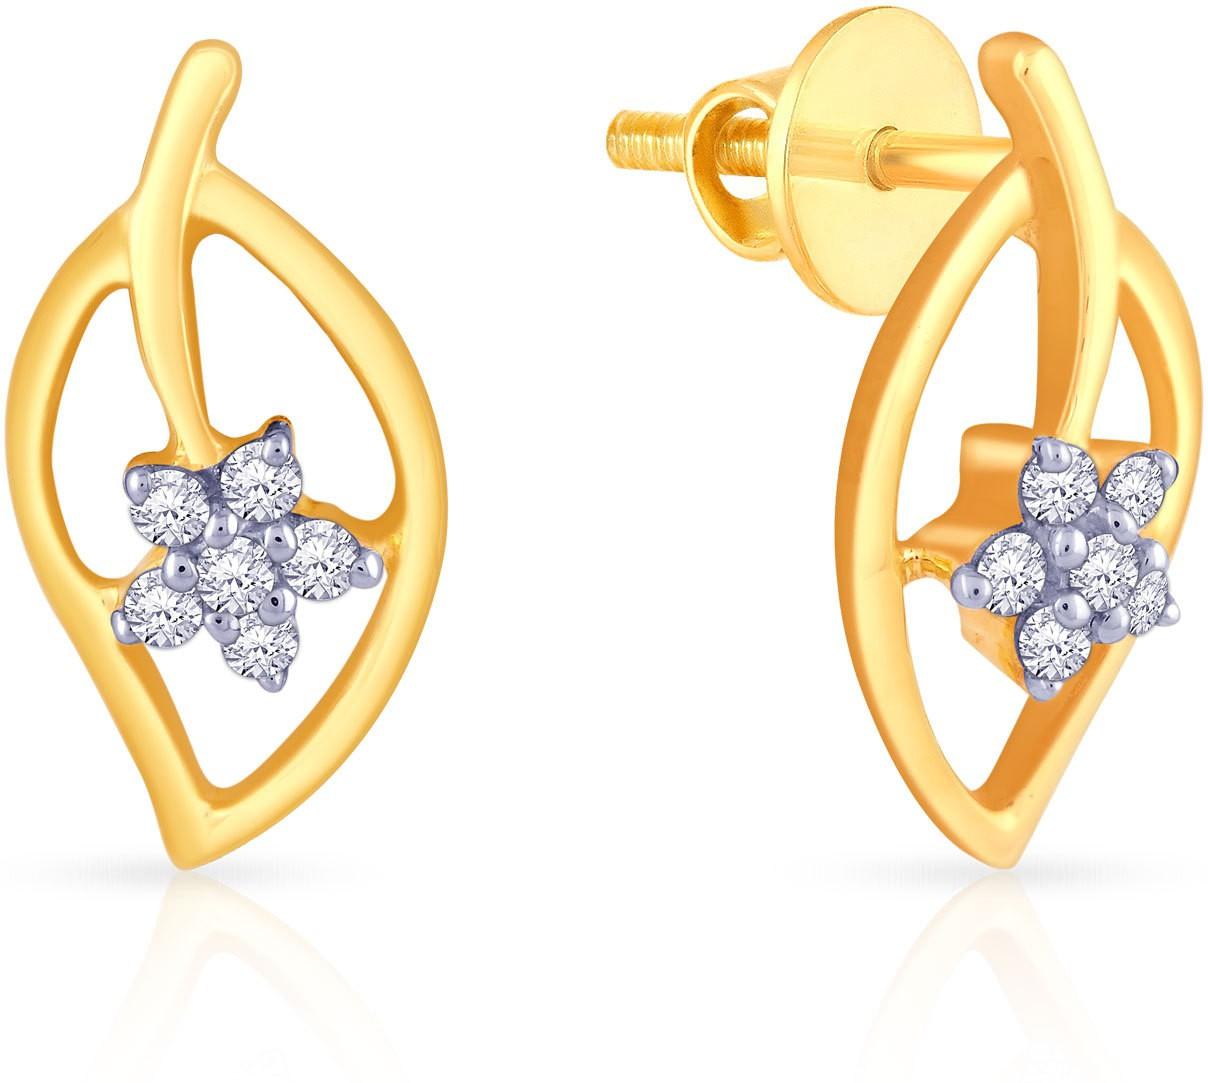 Malabar Gold And Diamonds E651988a Yellow 18kt Diamond Stud Earring